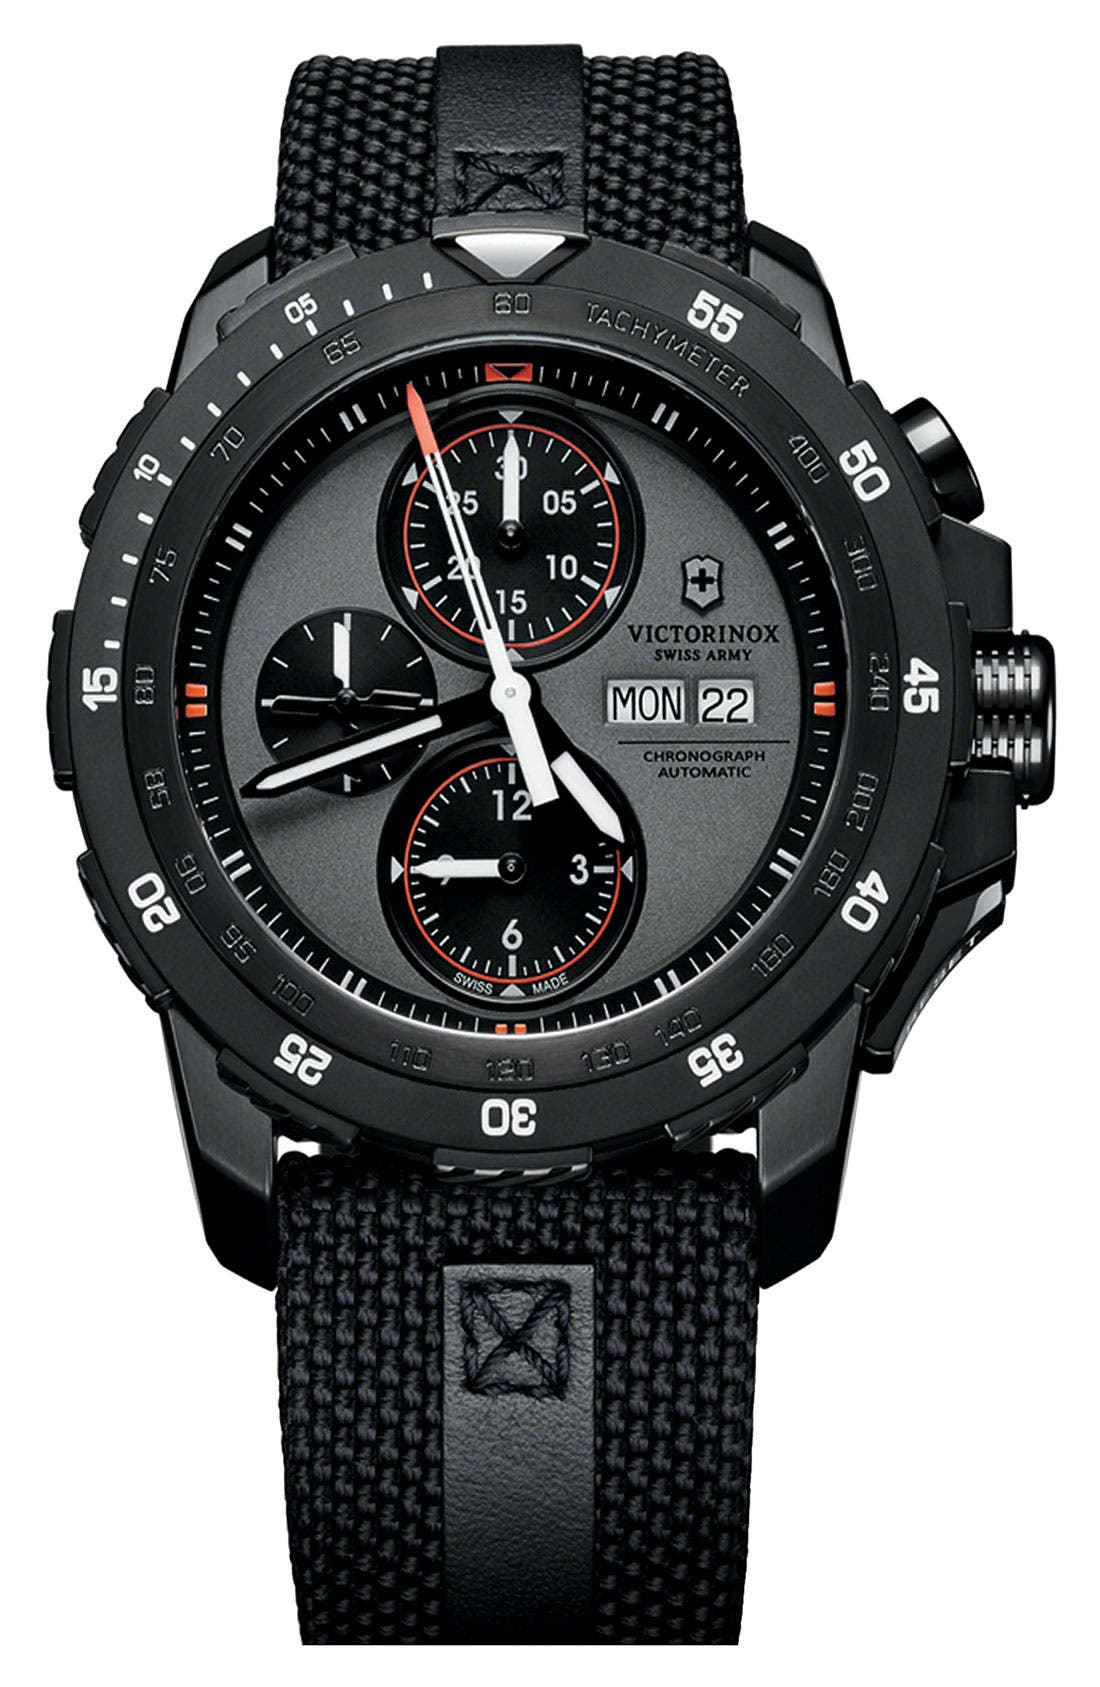 Alternate Image 1 Selected - Victorinox Swiss Army® 'Alpnach' Automatic Chronograph Watch, 44mm